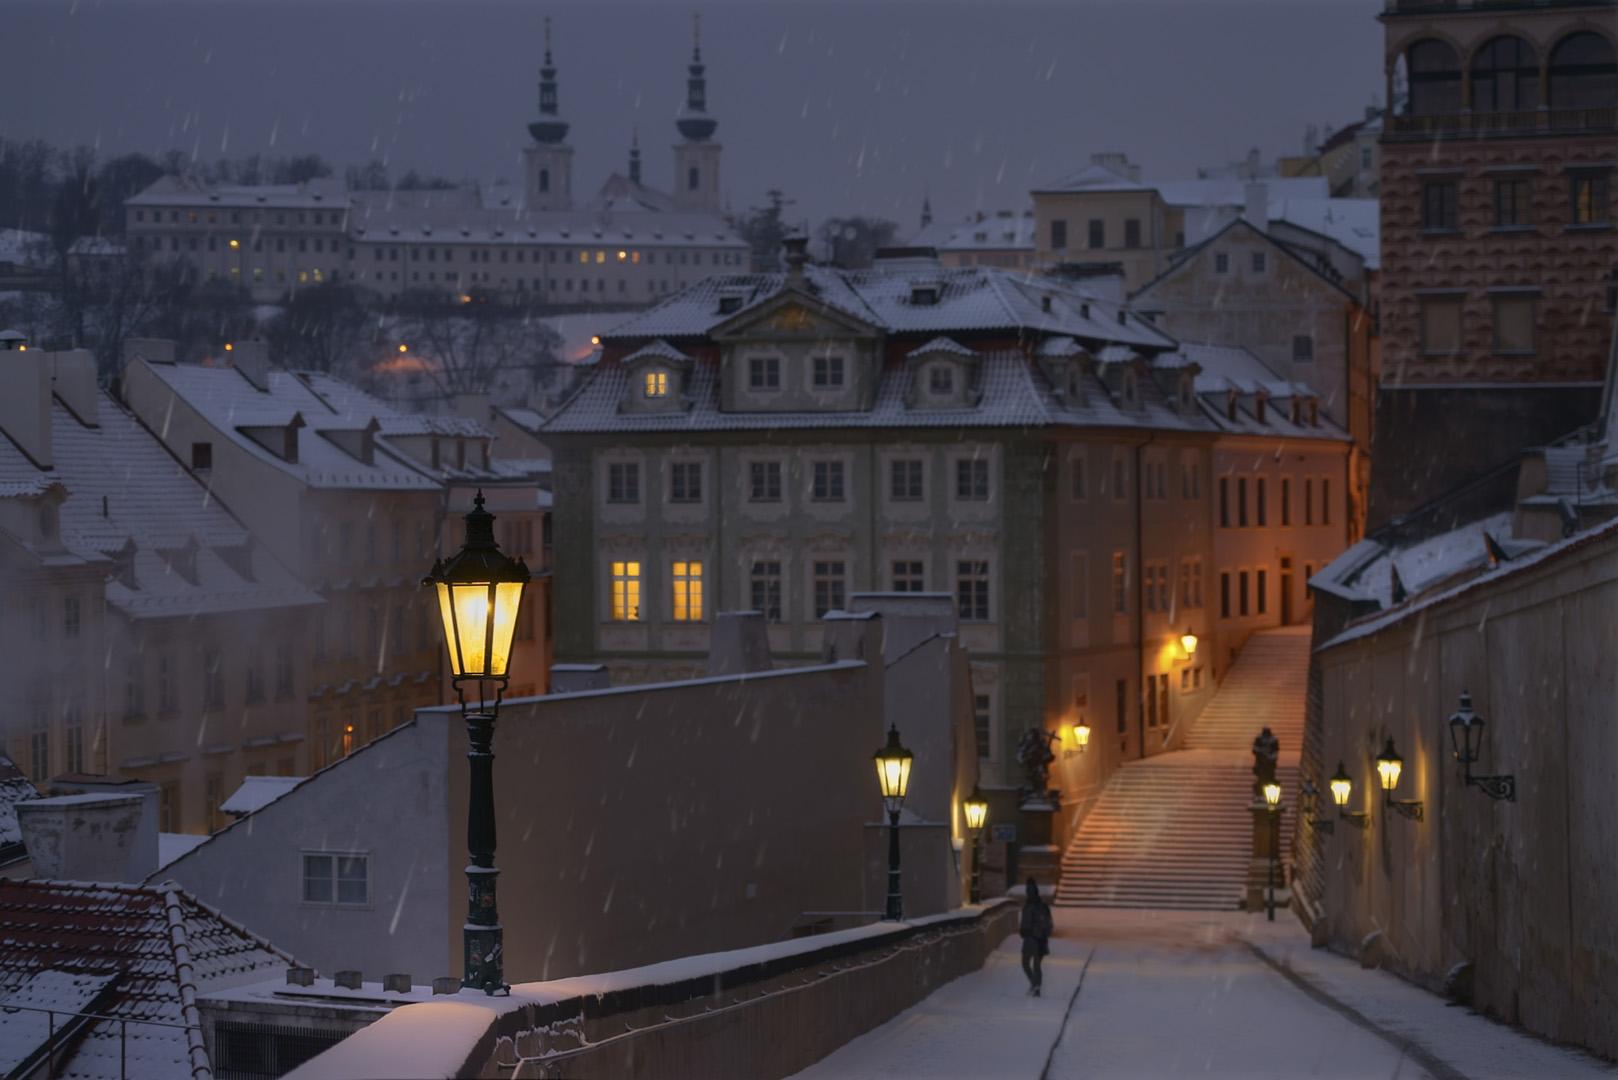 Tajemná Praha / Mysterious Prague | © Richard Horák: Zasněžená Nerudovka / Snowfall in Neruda street